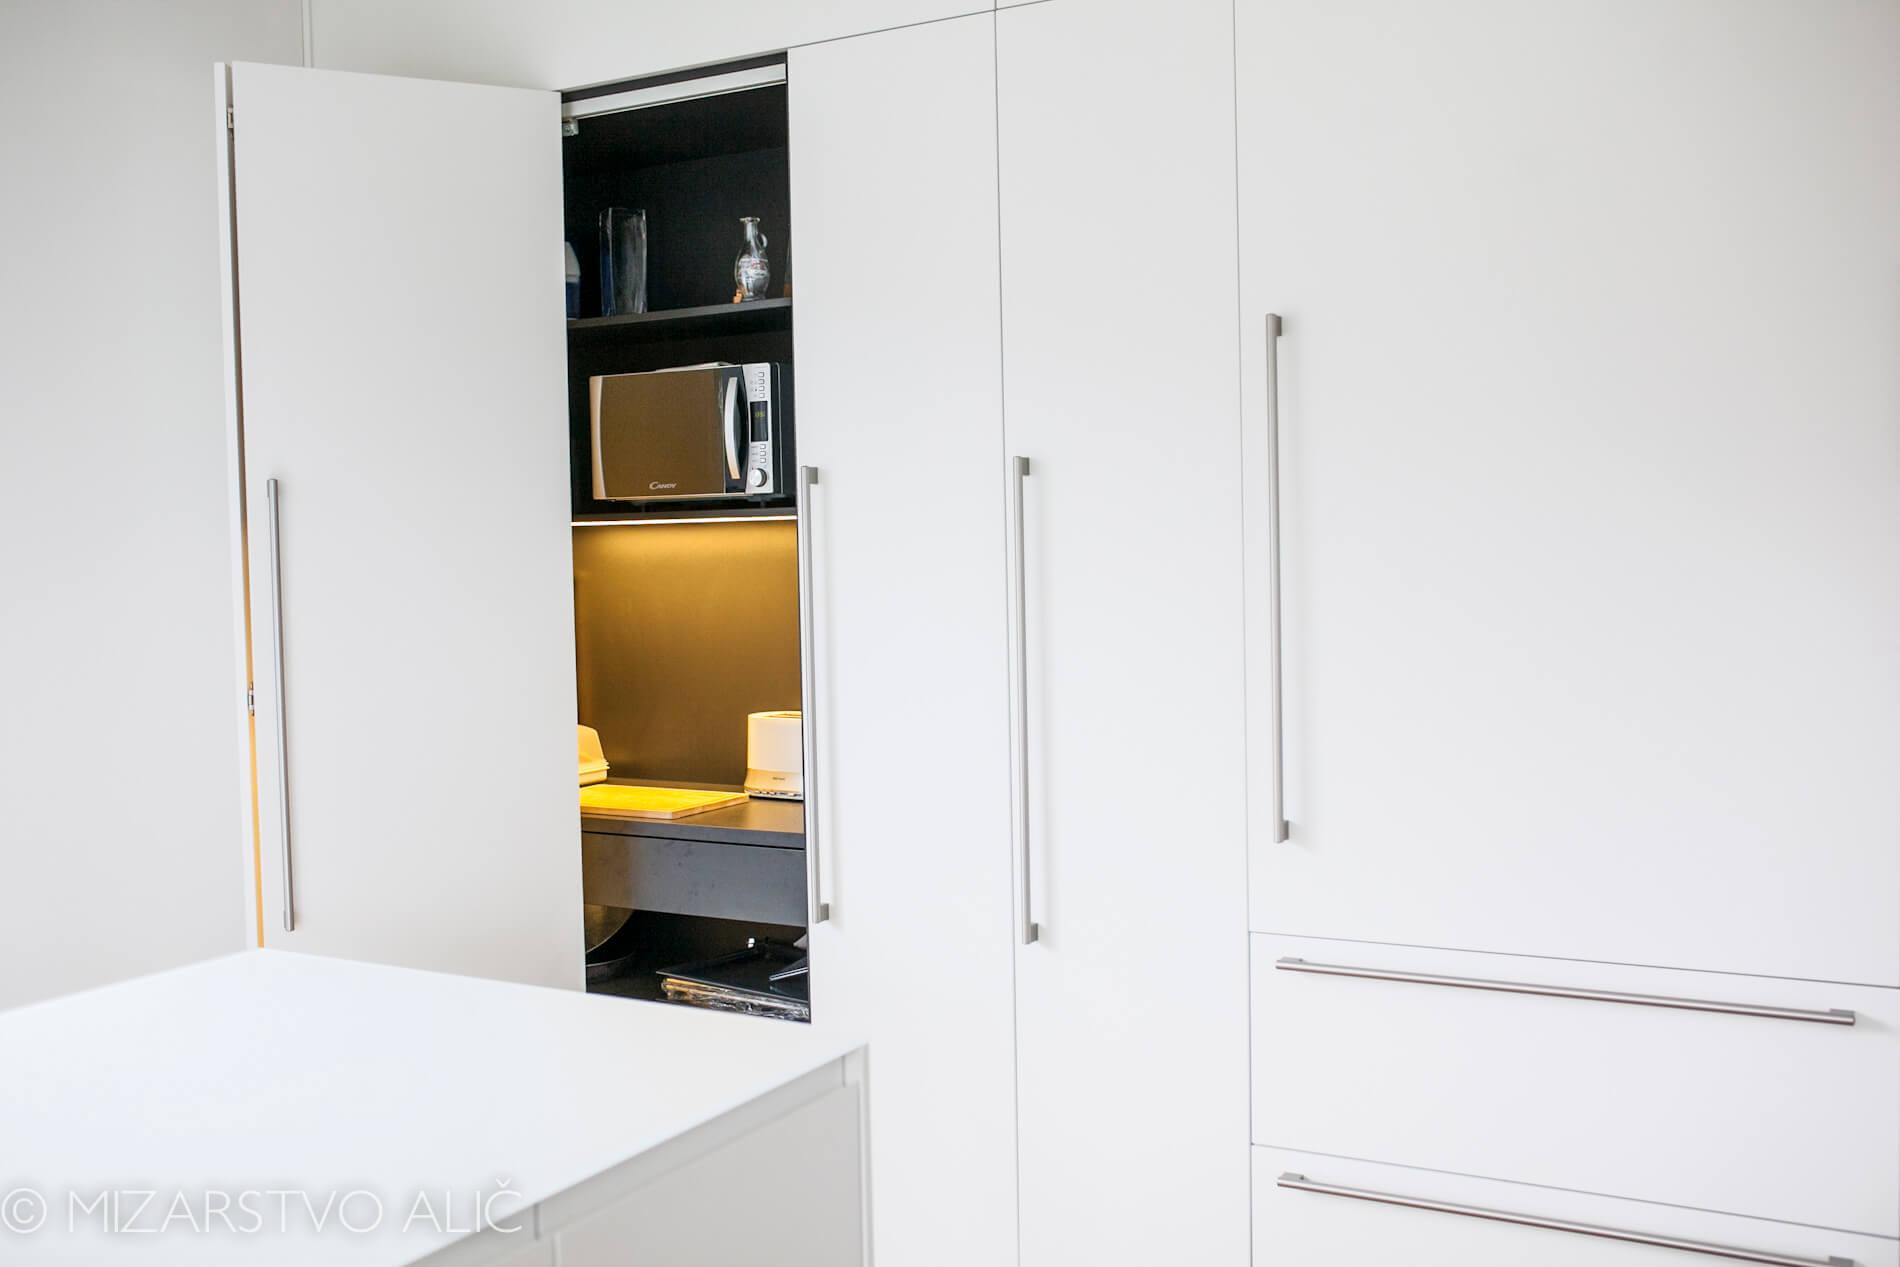 pohištvo za kuhinjo bela kuhinja